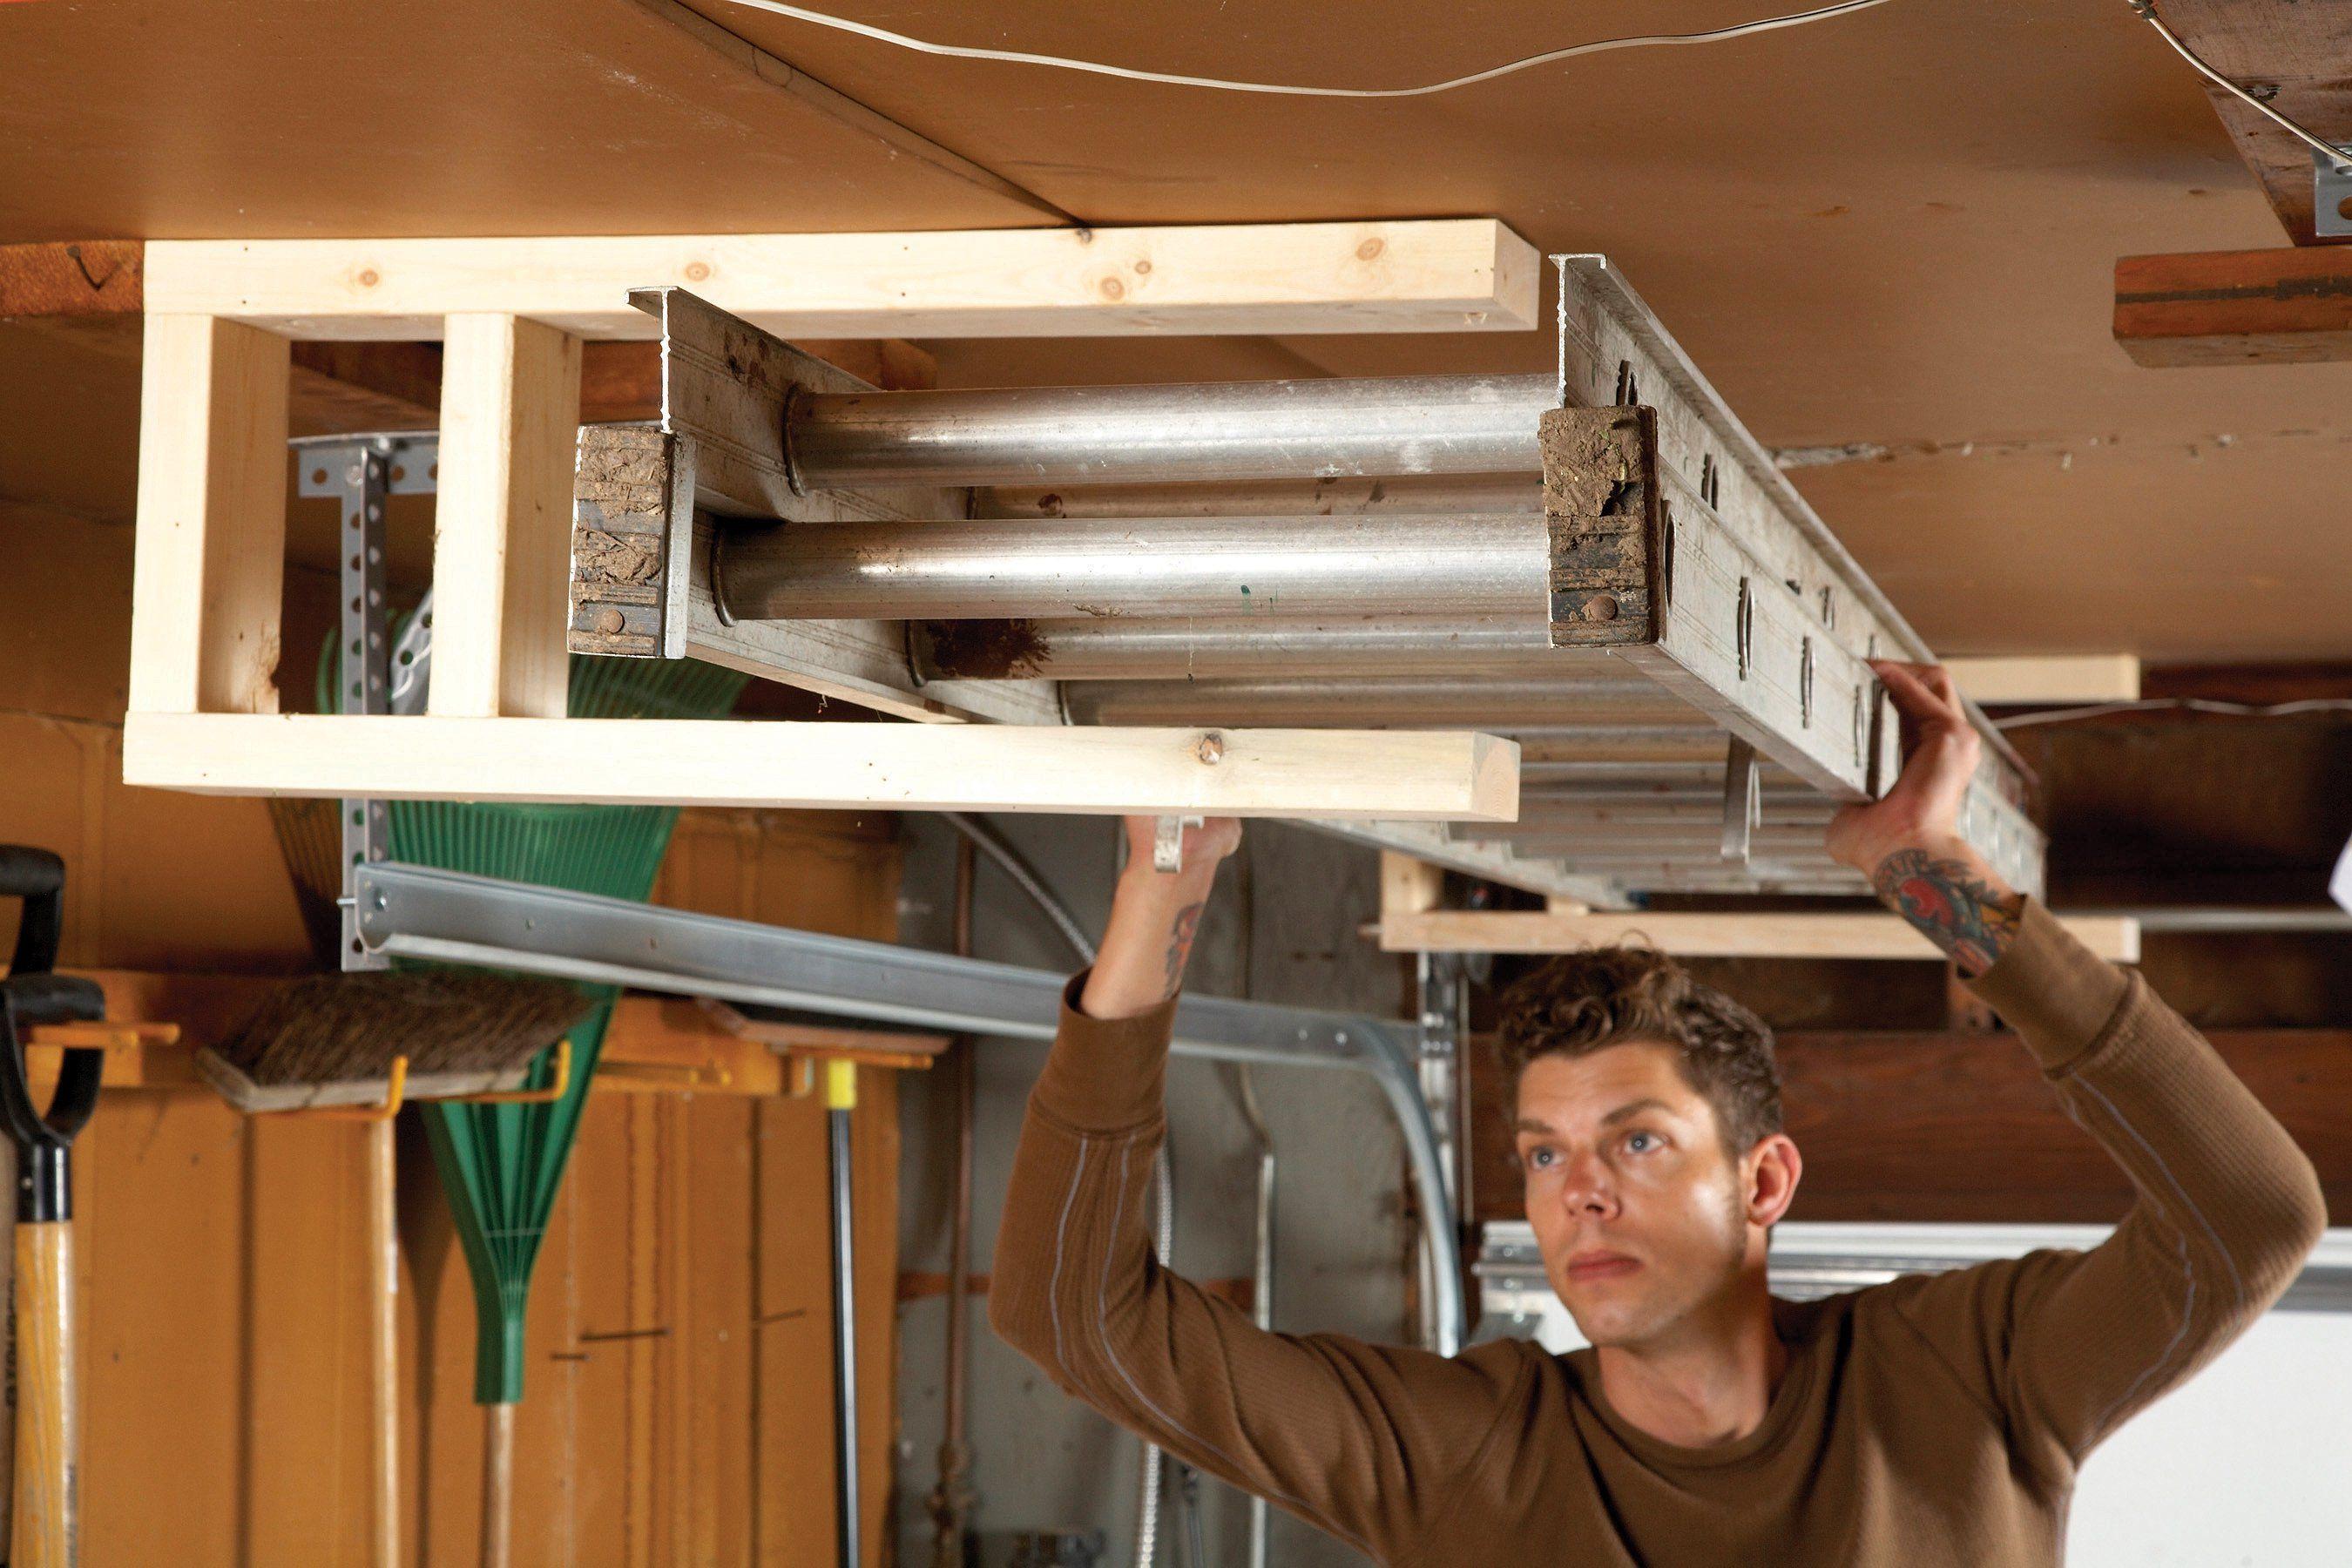 sneak peek ingenious garage storage ideas ladder on cheap diy garage organization ideas to inspire you tips for clearing id=56850